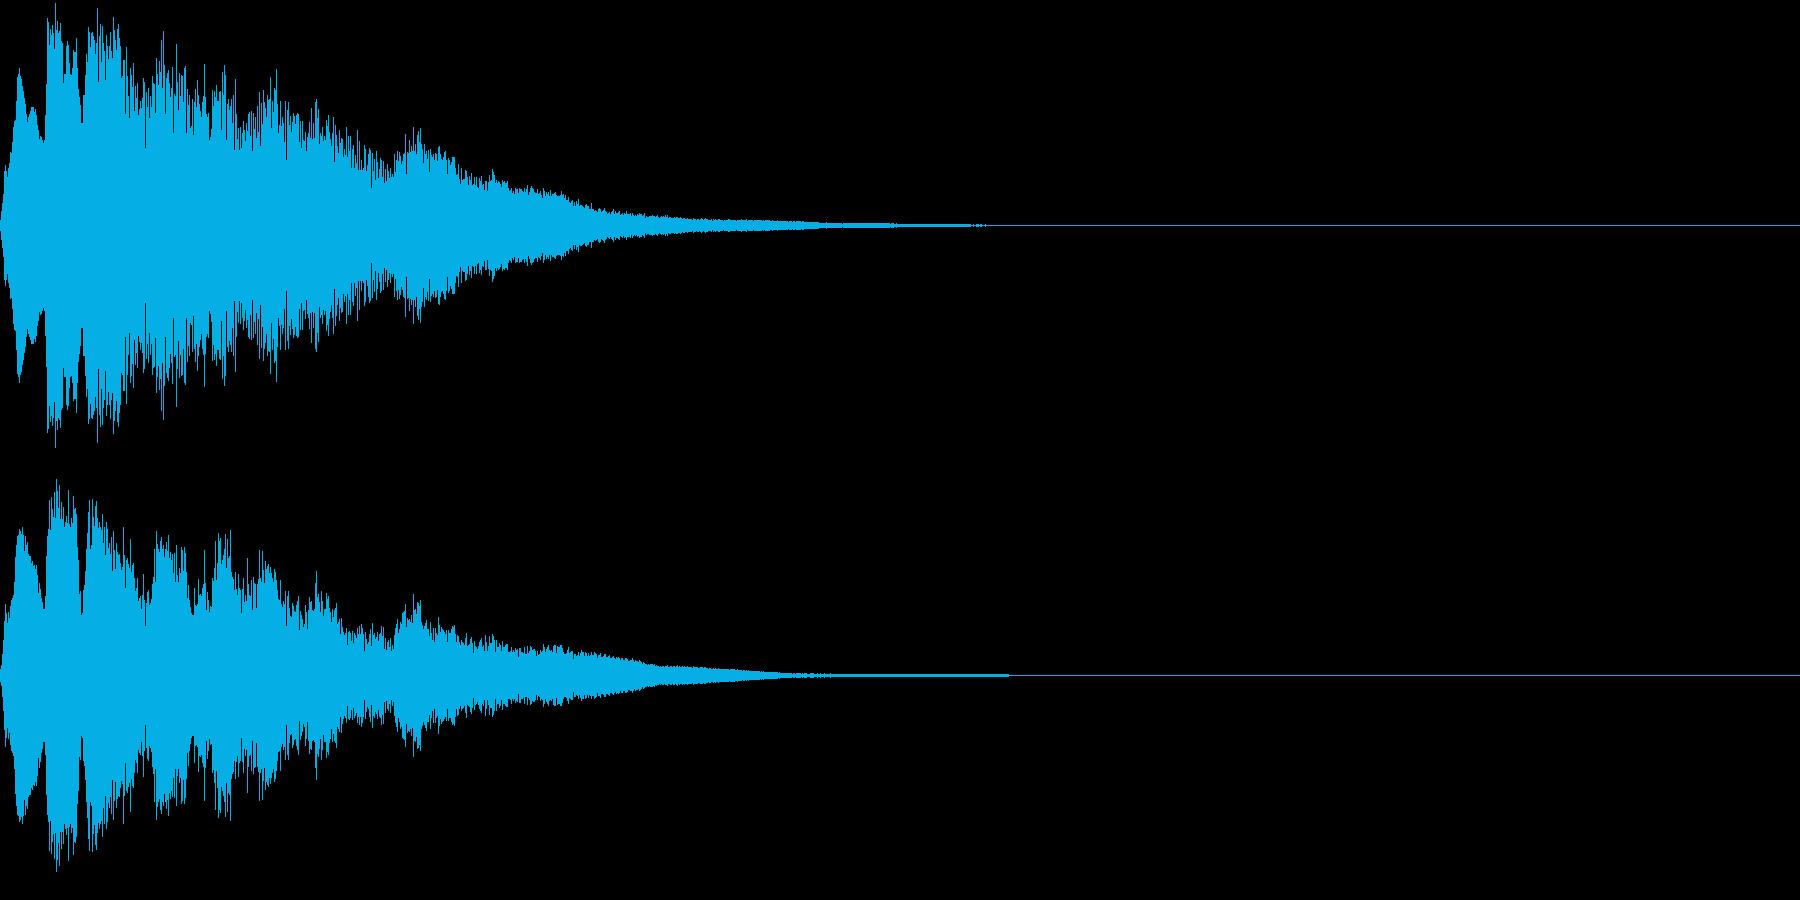 理科 化学 実験 変化 不思議 22の再生済みの波形